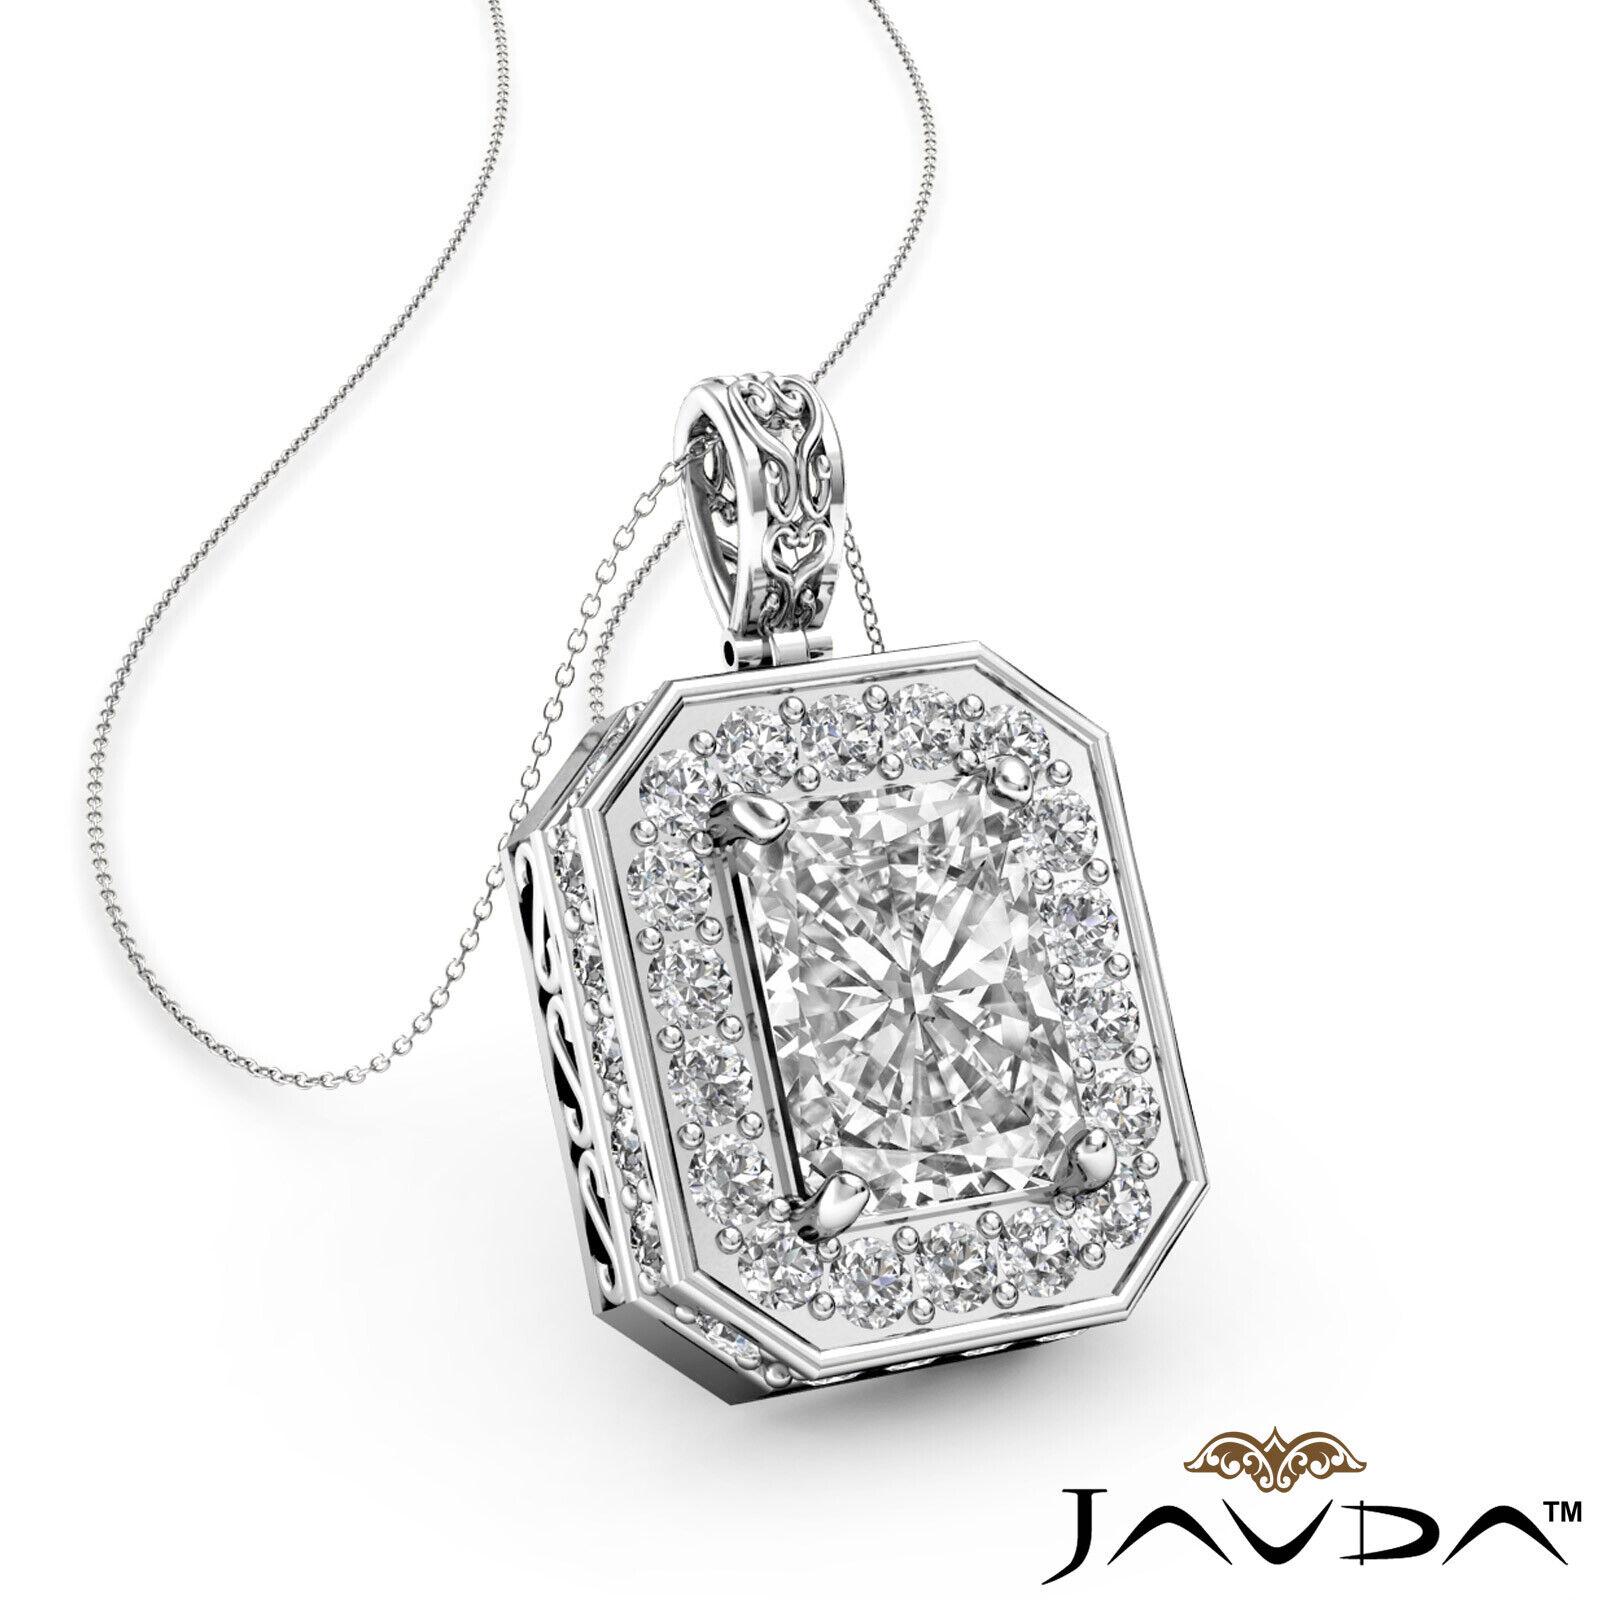 1.11ctw Circa Halo Pave Set Radiant Natural Diamond Filigree Pendant Necklace